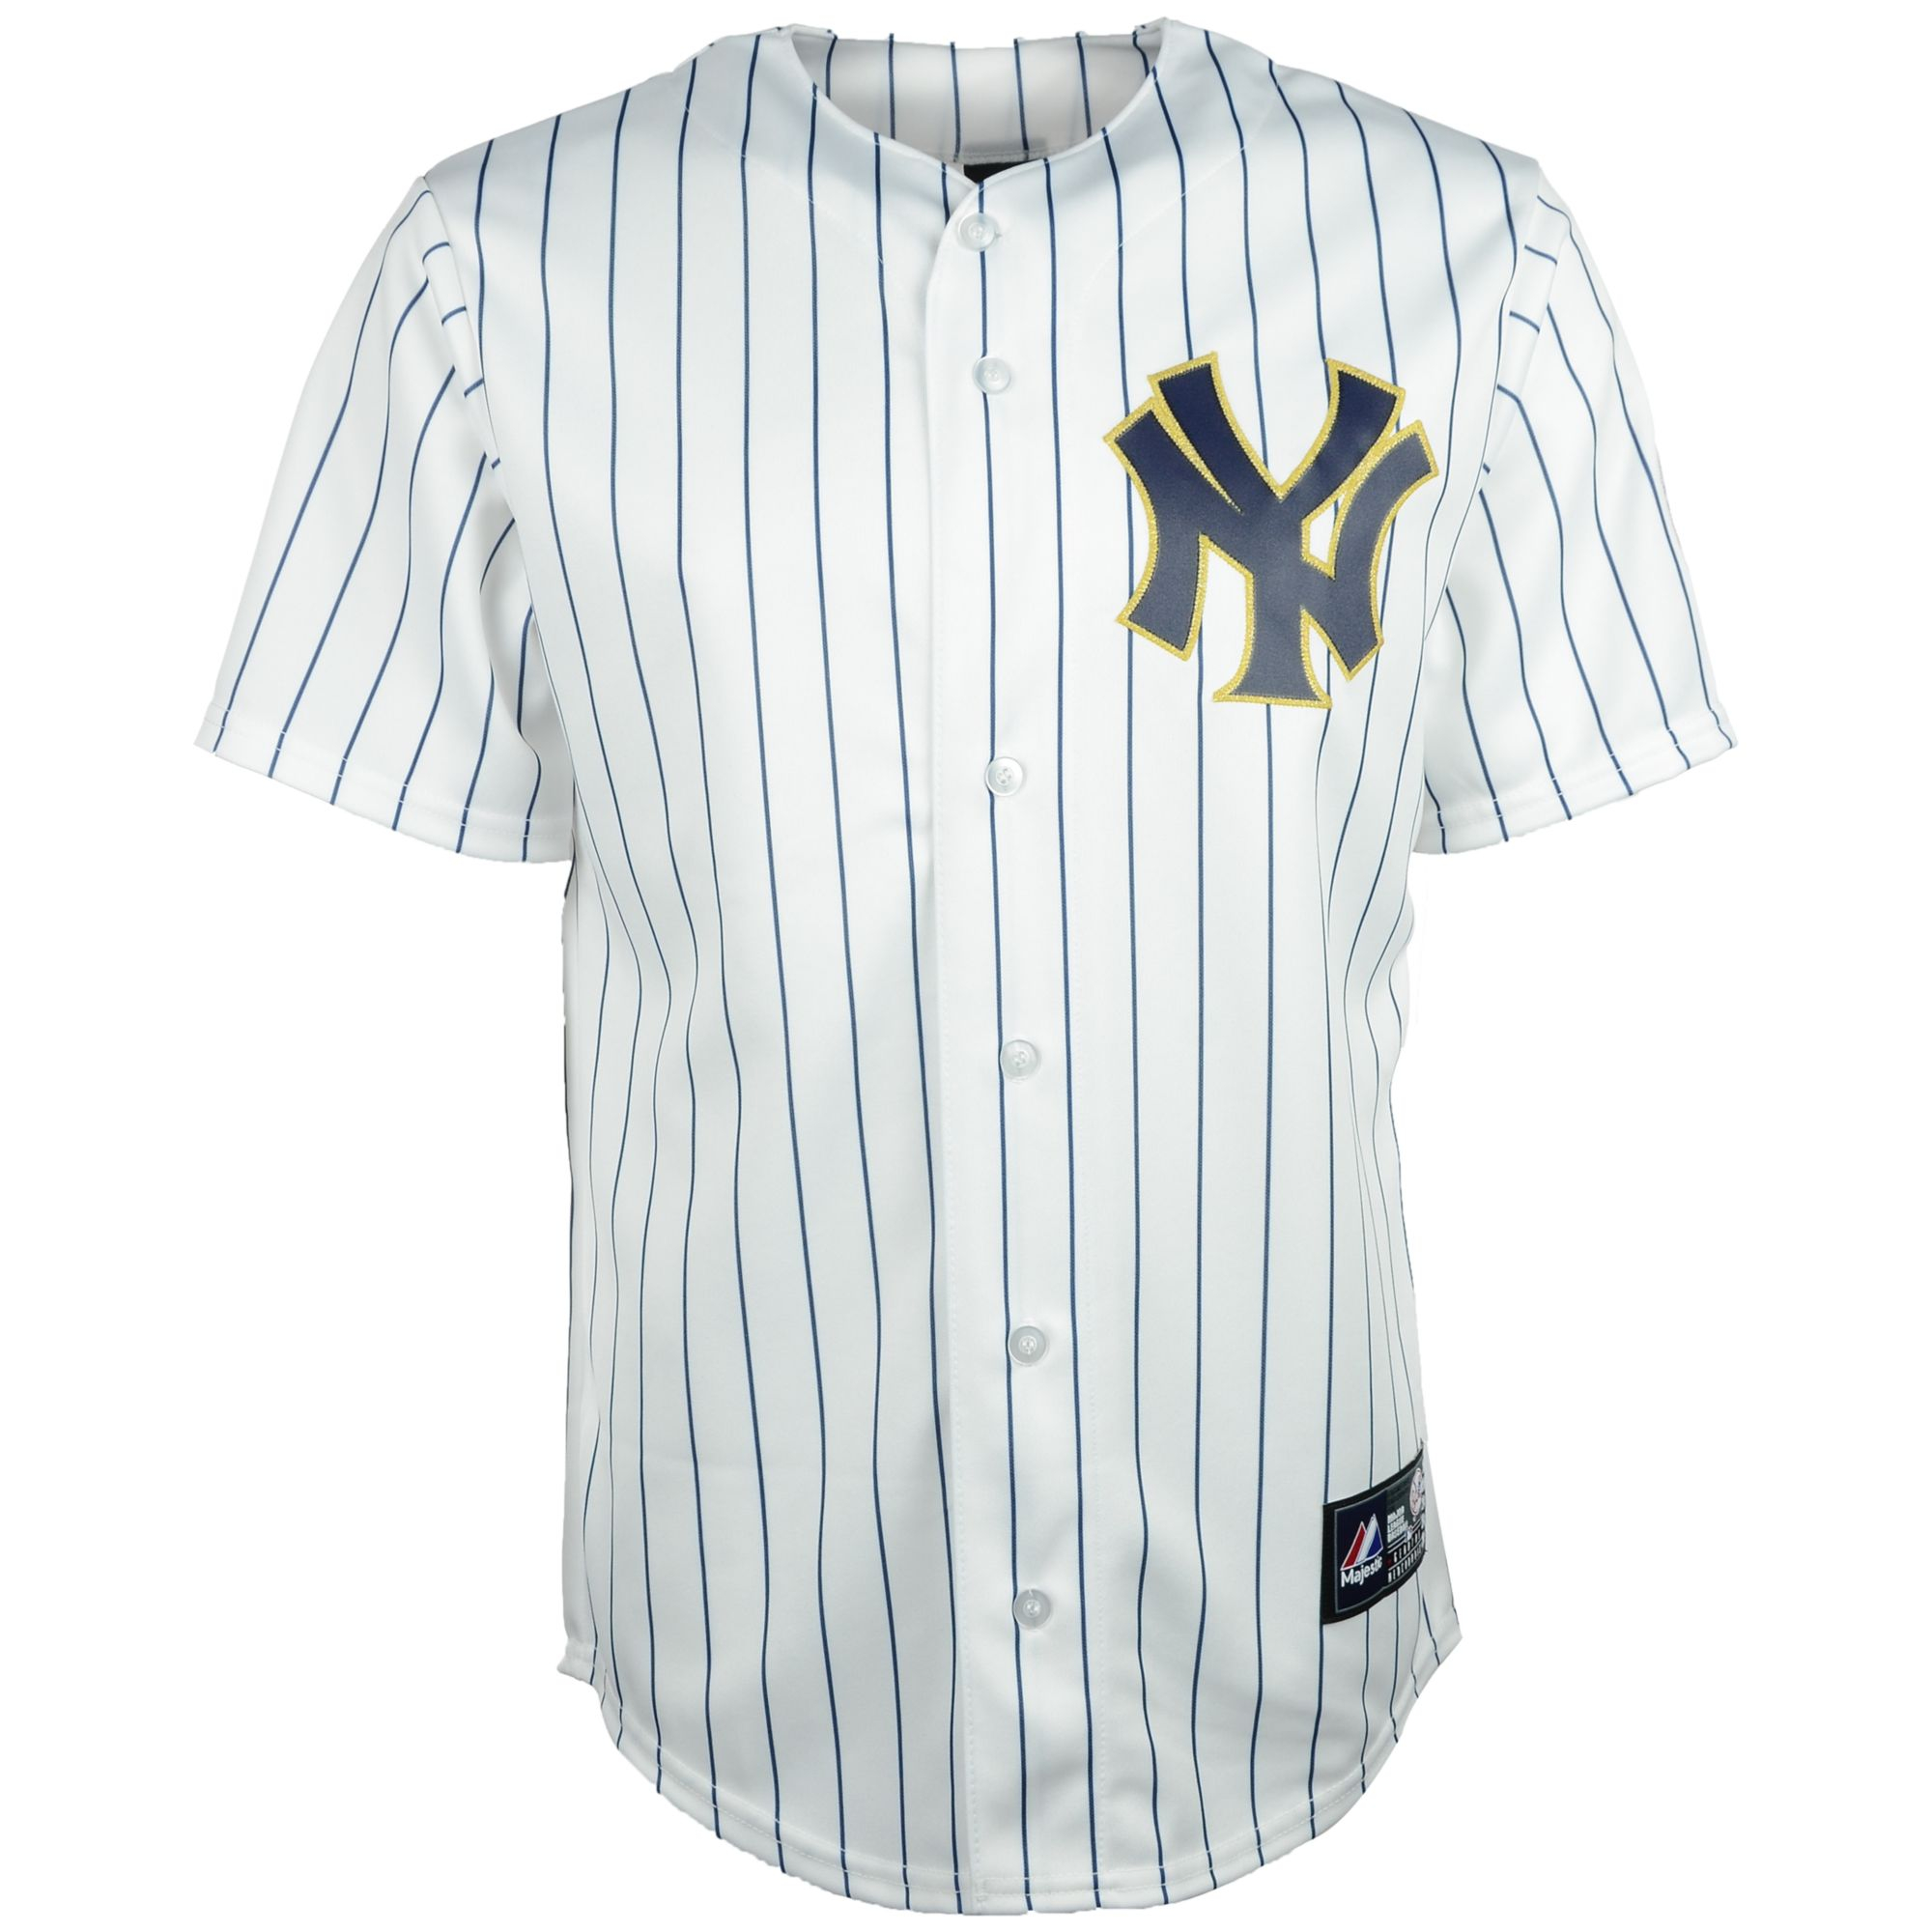 825e42a19 Lyst - Majestic Mens Derek Jeter New York Yankees Commemorative ...